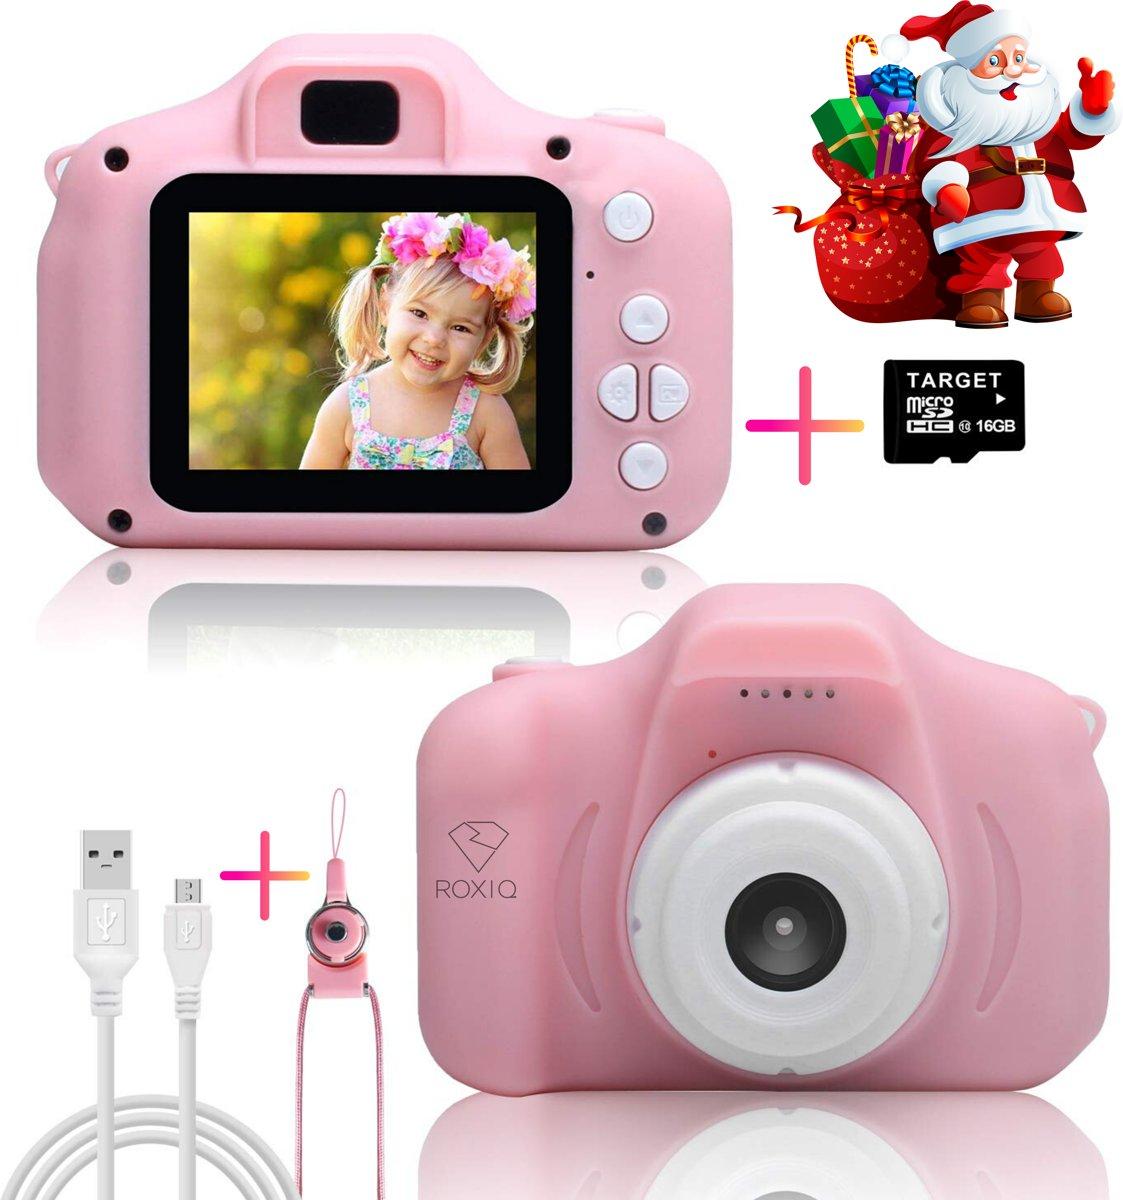 Roxiq Kinder Camera KC1 Roze � Digitale camera � 1080P HD � Fototoestel voor kinderen